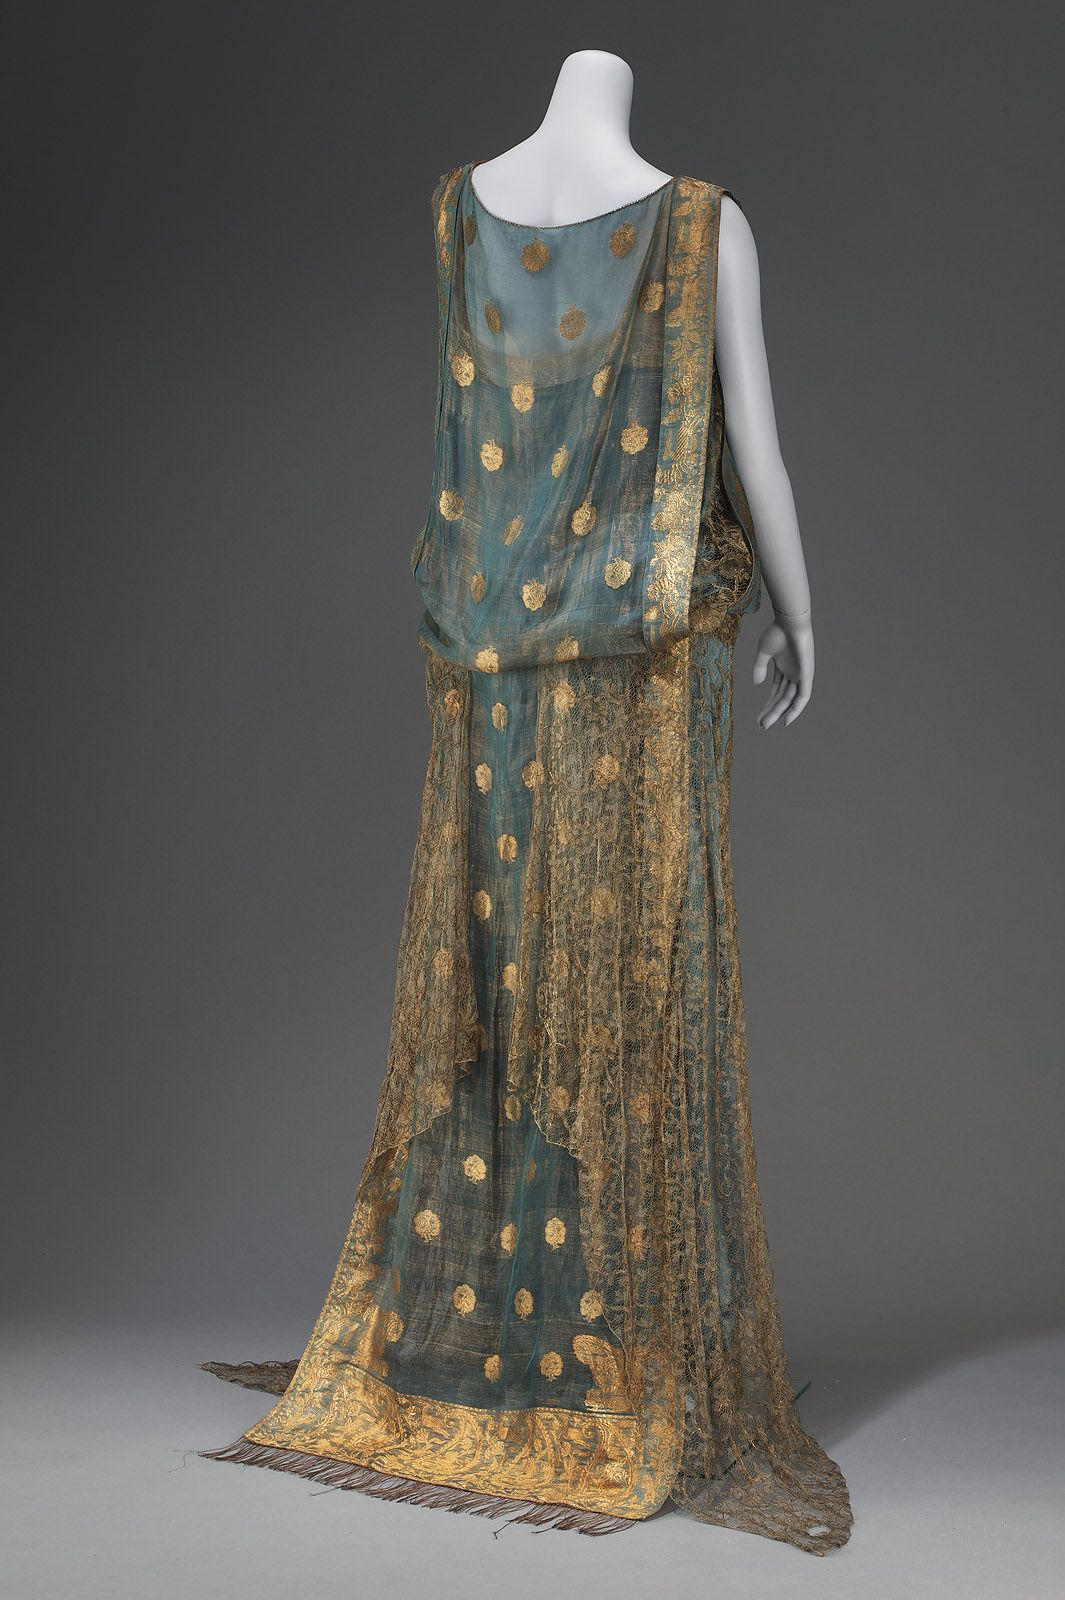 """VanderBiltmore Style"" Ladies Evening Dress CA. First Half Of 20TH Century MEDIUM OR TECHNIQUE: Silk brocaded with gold metallic yarns, silk satin, silk tulle, and metal snaps."